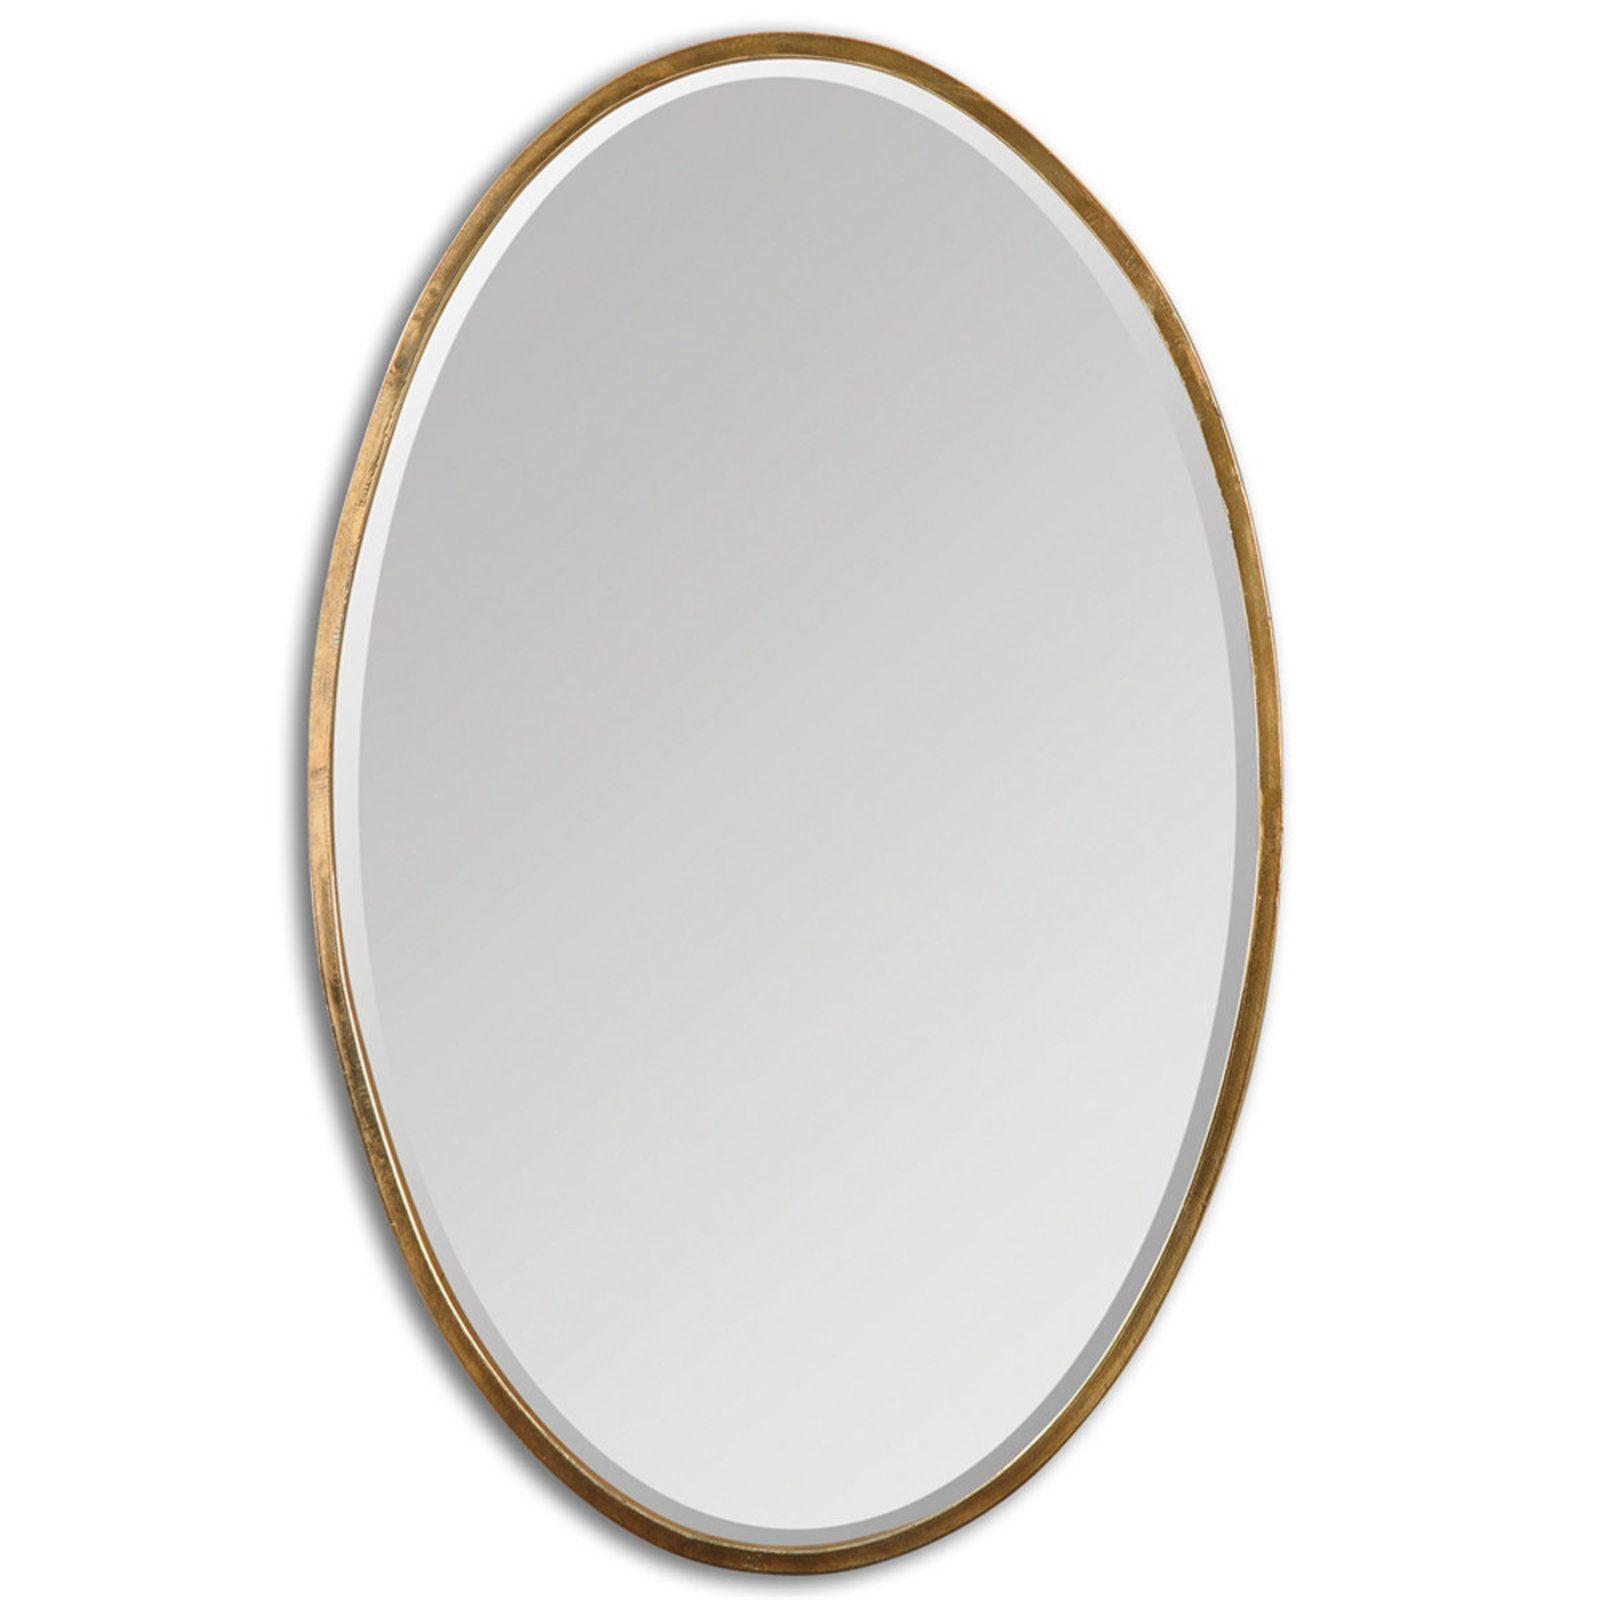 Minimalist Modern Gold Mirror | Minimalist, Modern and Powder room